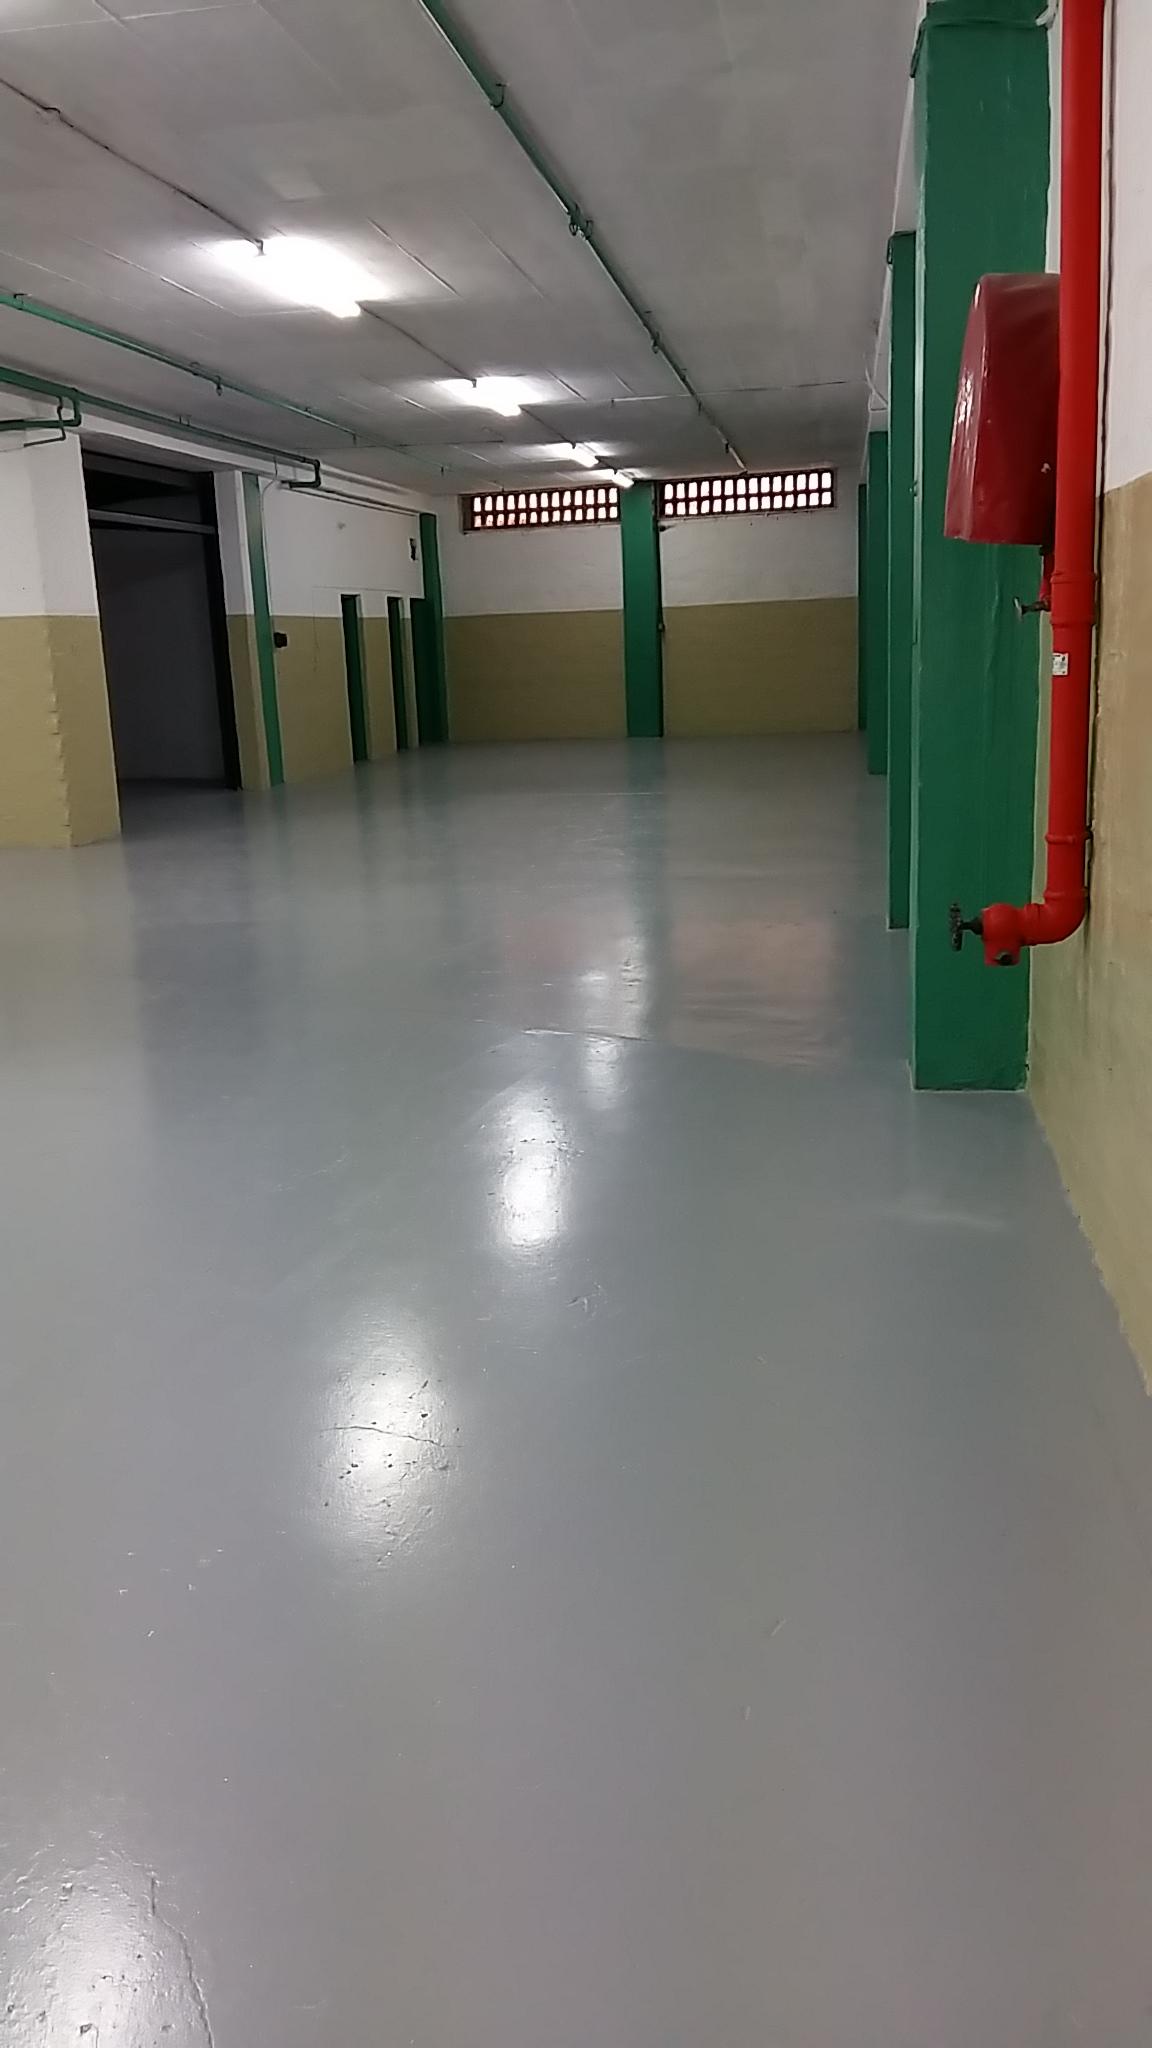 800m2 premises near Argyle Corner with Large roller door access @ R40m2 = R32000pm